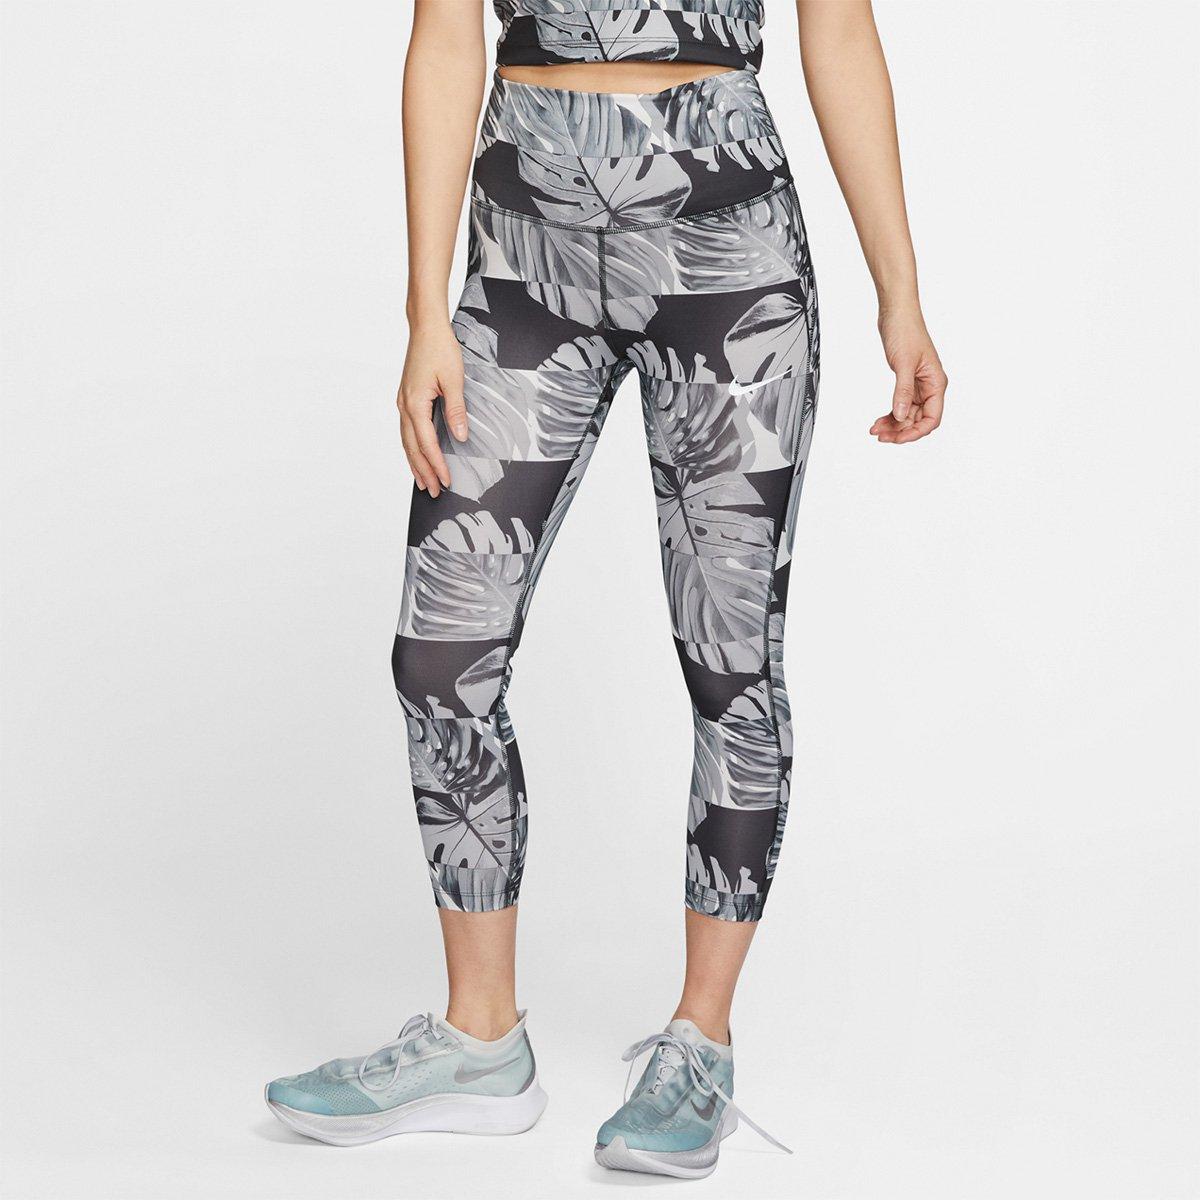 Calça Legging Nike Fast Feminina